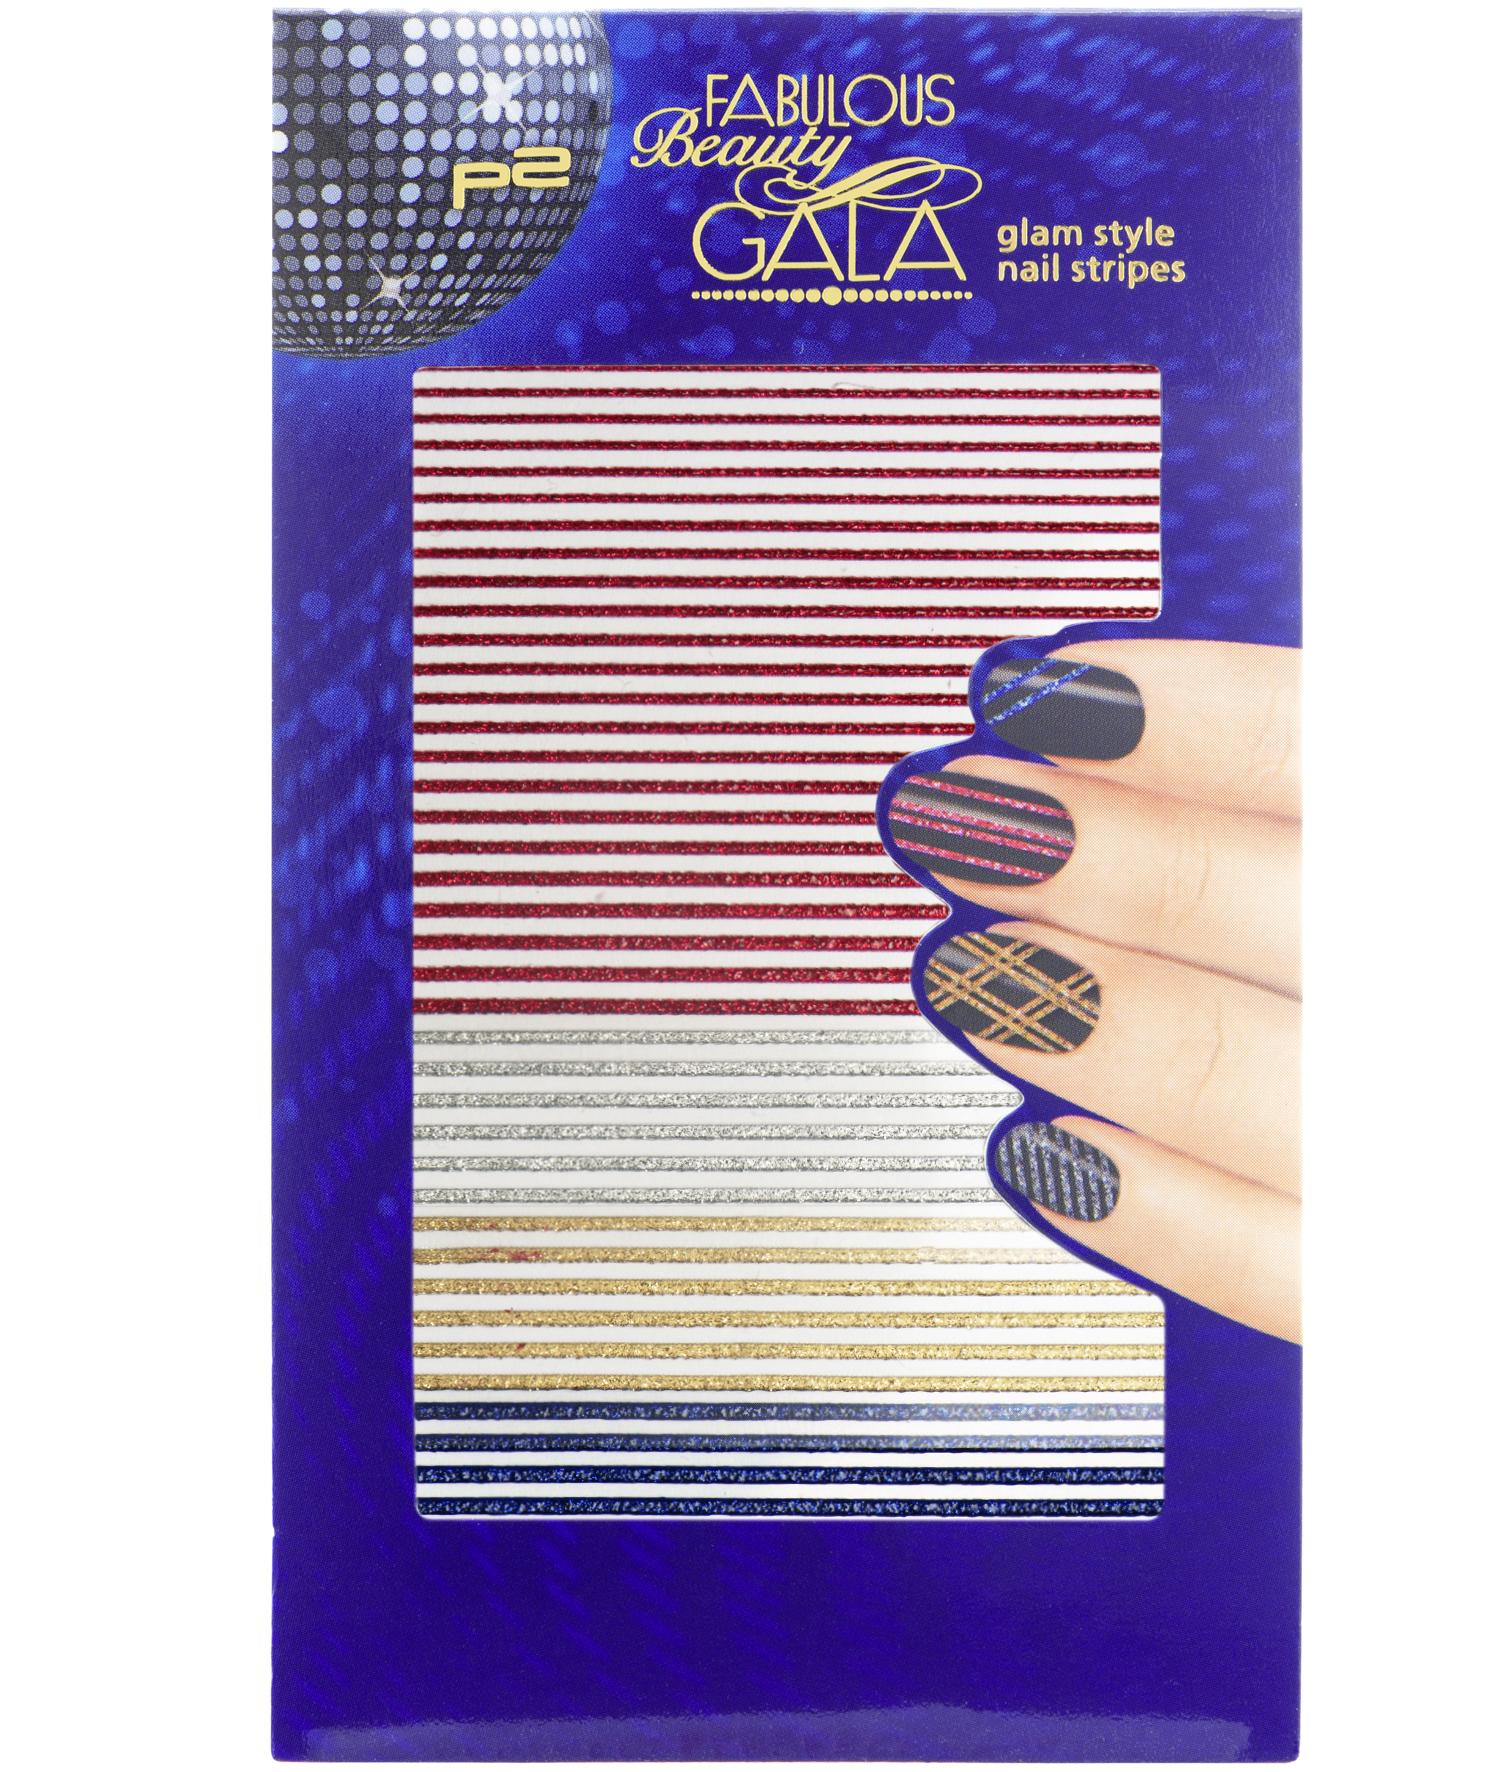 glam style nail stripes